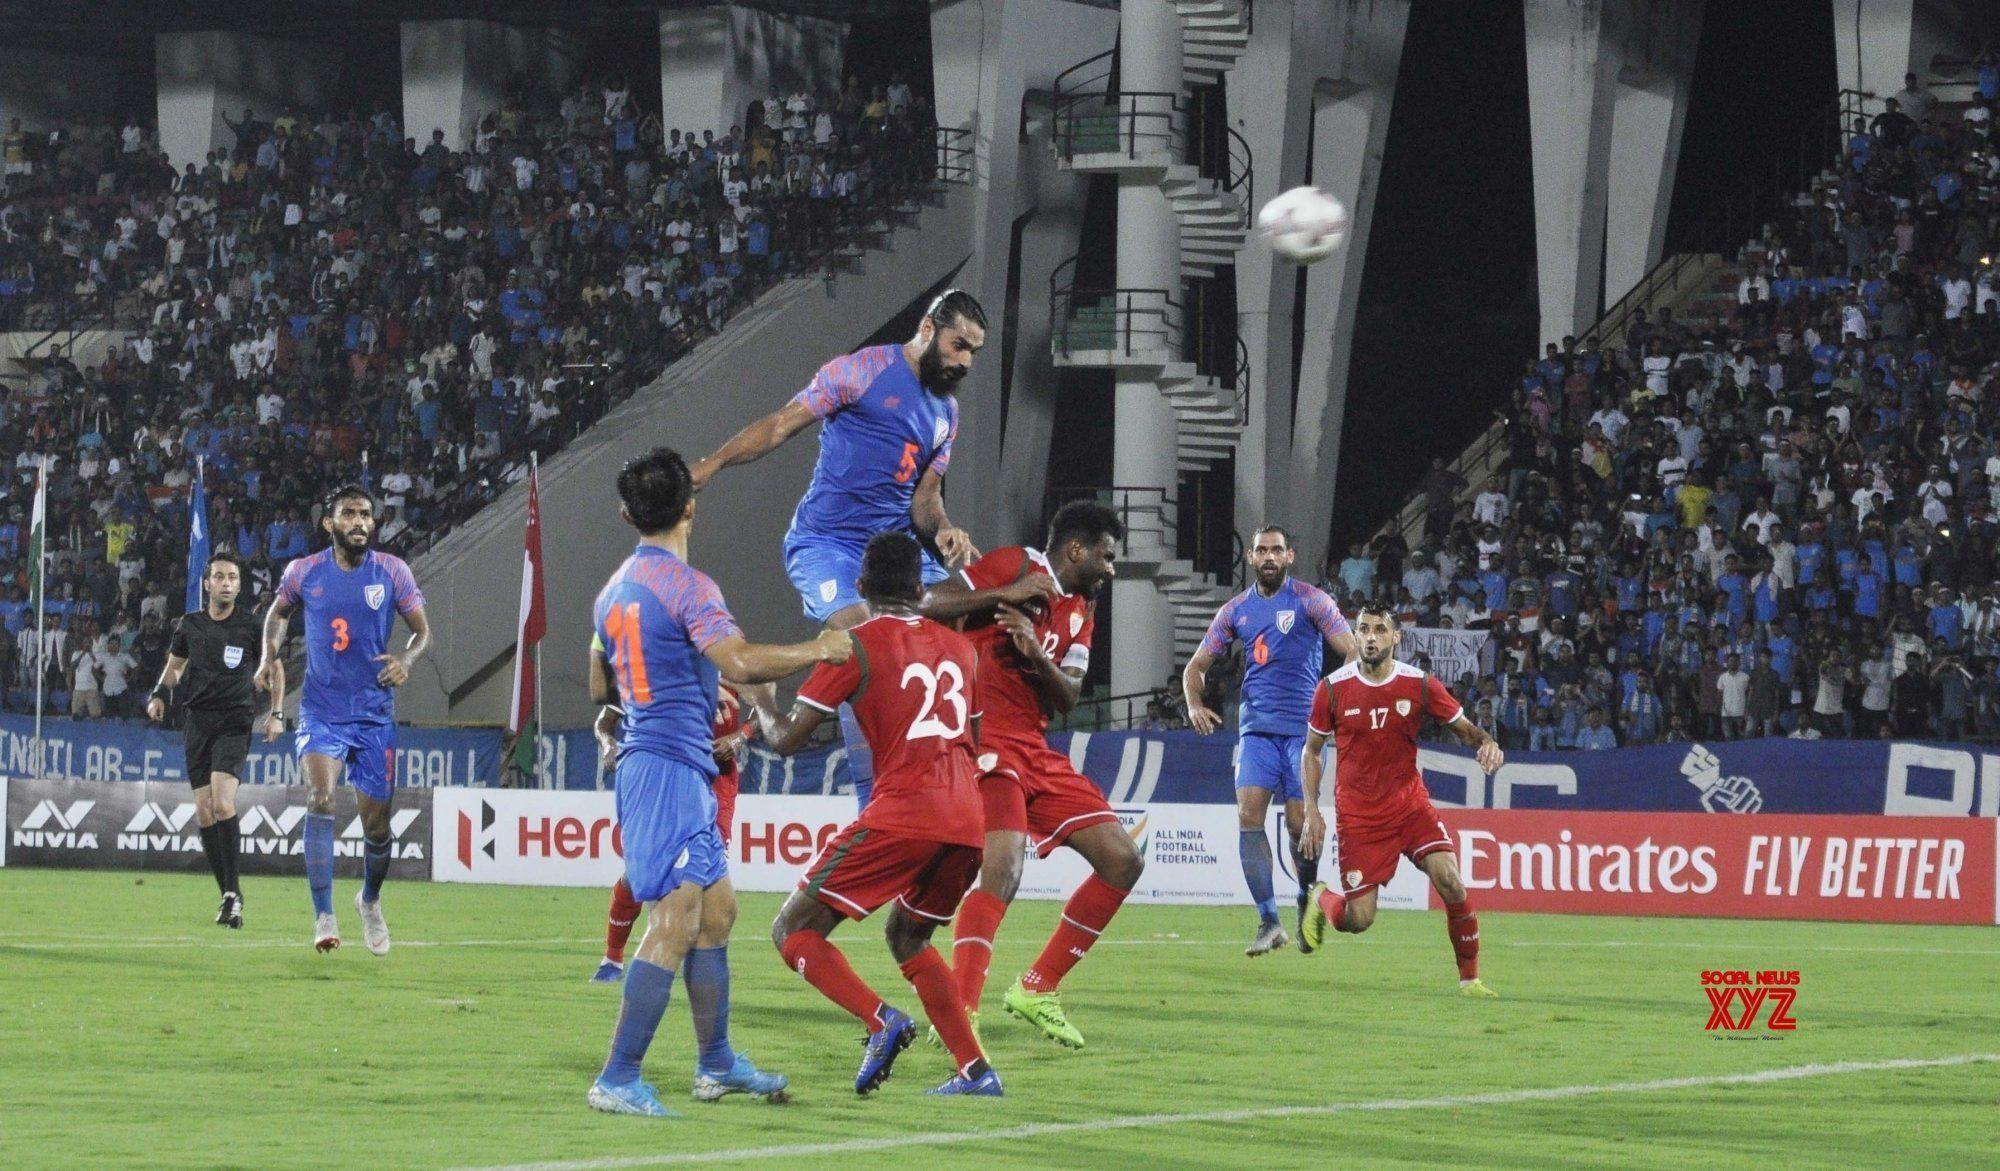 Guwahati 2022 Fifa World Cup Qualifier India Vs Oman Gallery 2022 Fifa World Cup Fifa World Cup World Cup Qualifiers